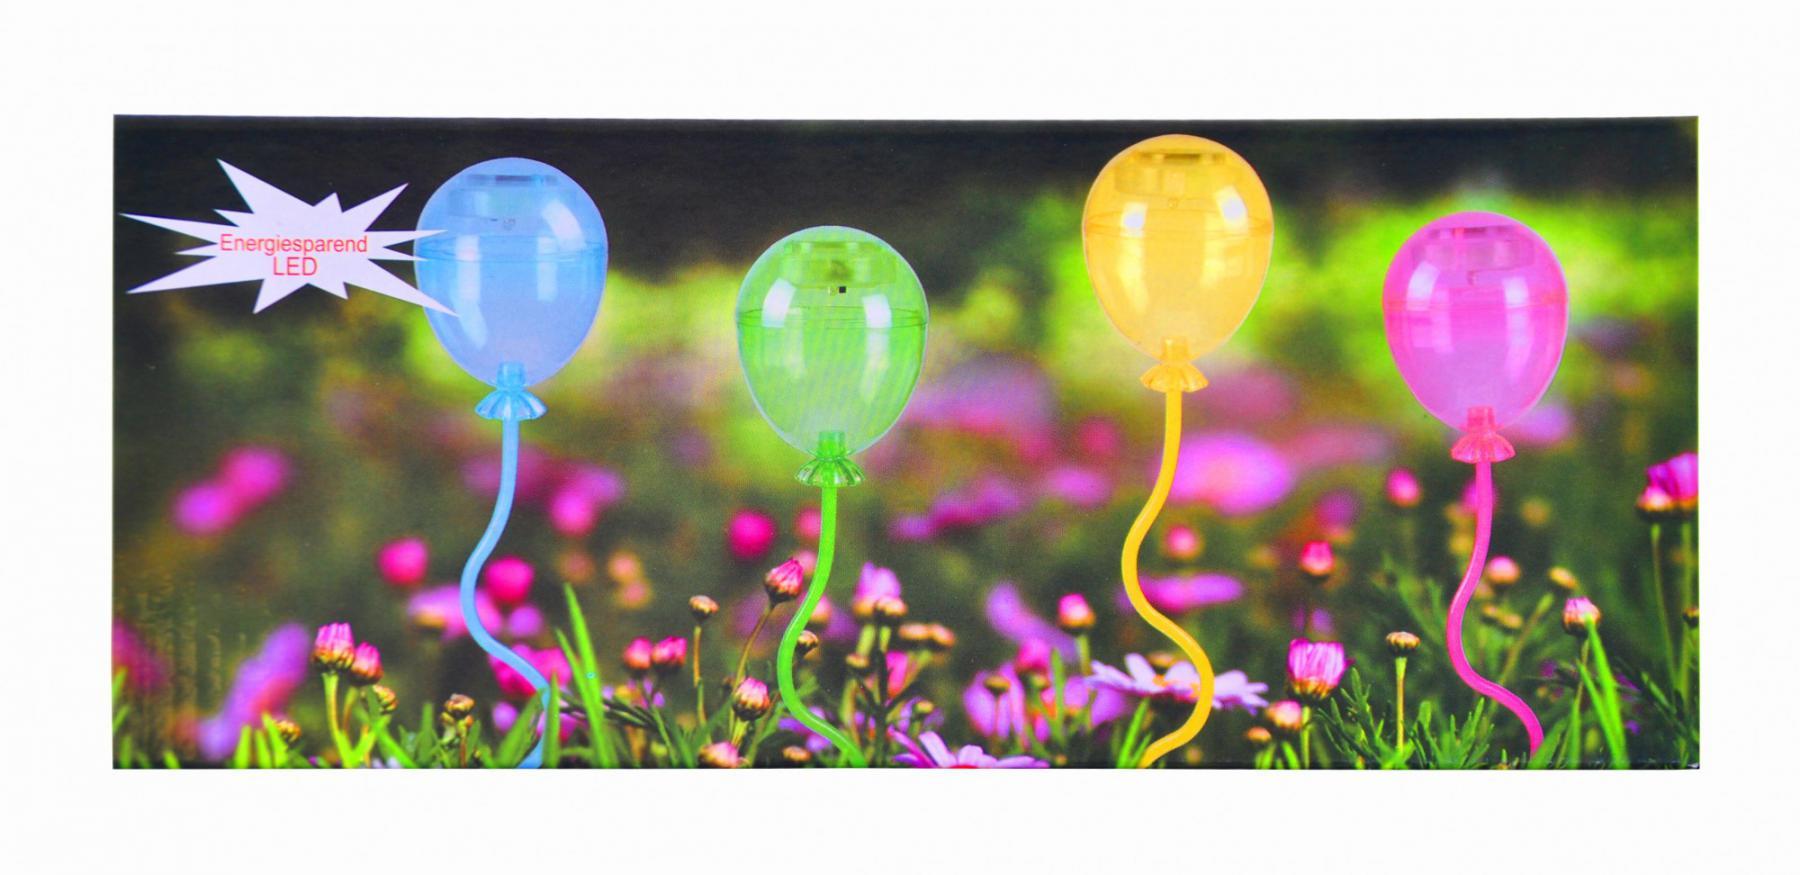 solar led 4er ballon set mit schalter leuchtdeko deko. Black Bedroom Furniture Sets. Home Design Ideas